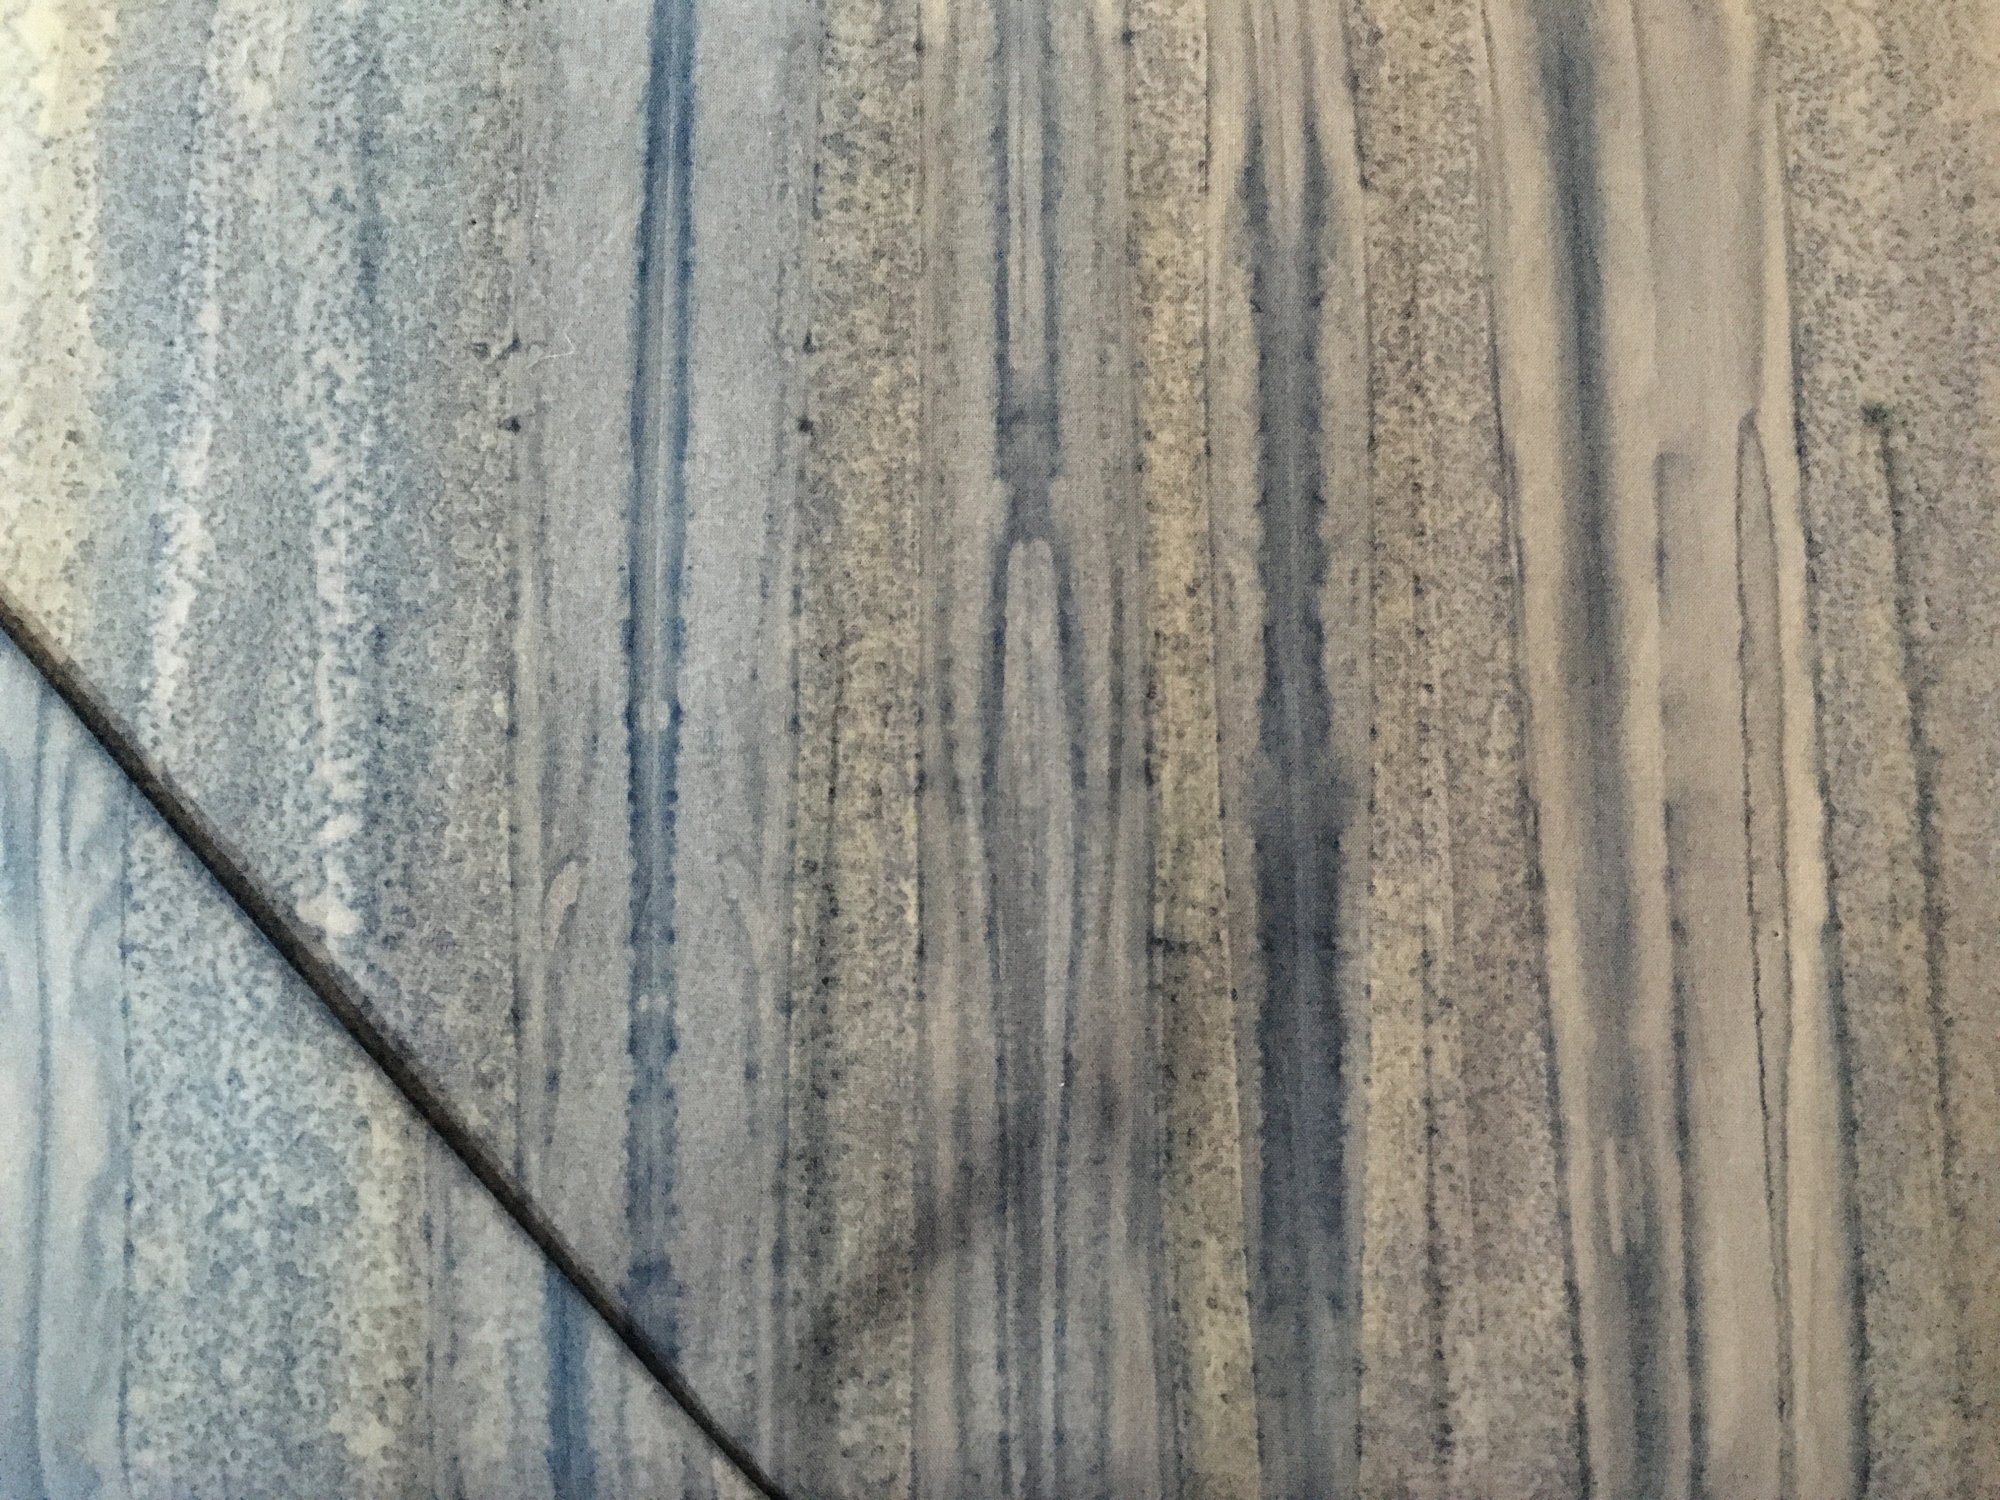 BATIK BLUE/GREY STRIPE 72FND003 Fabrics That Care